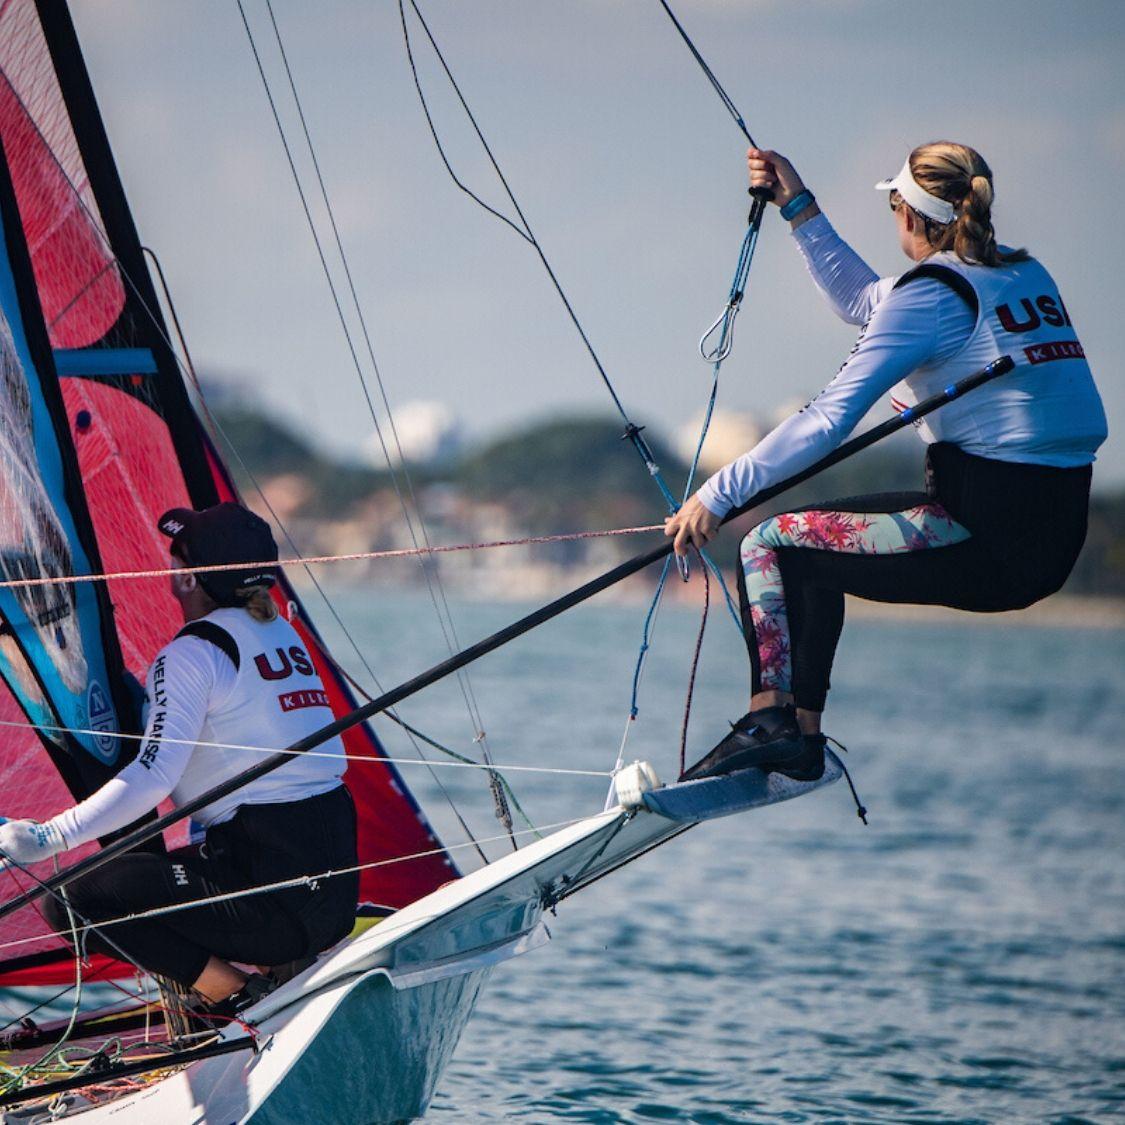 SPT athlete steph roble professional sailor fitness program